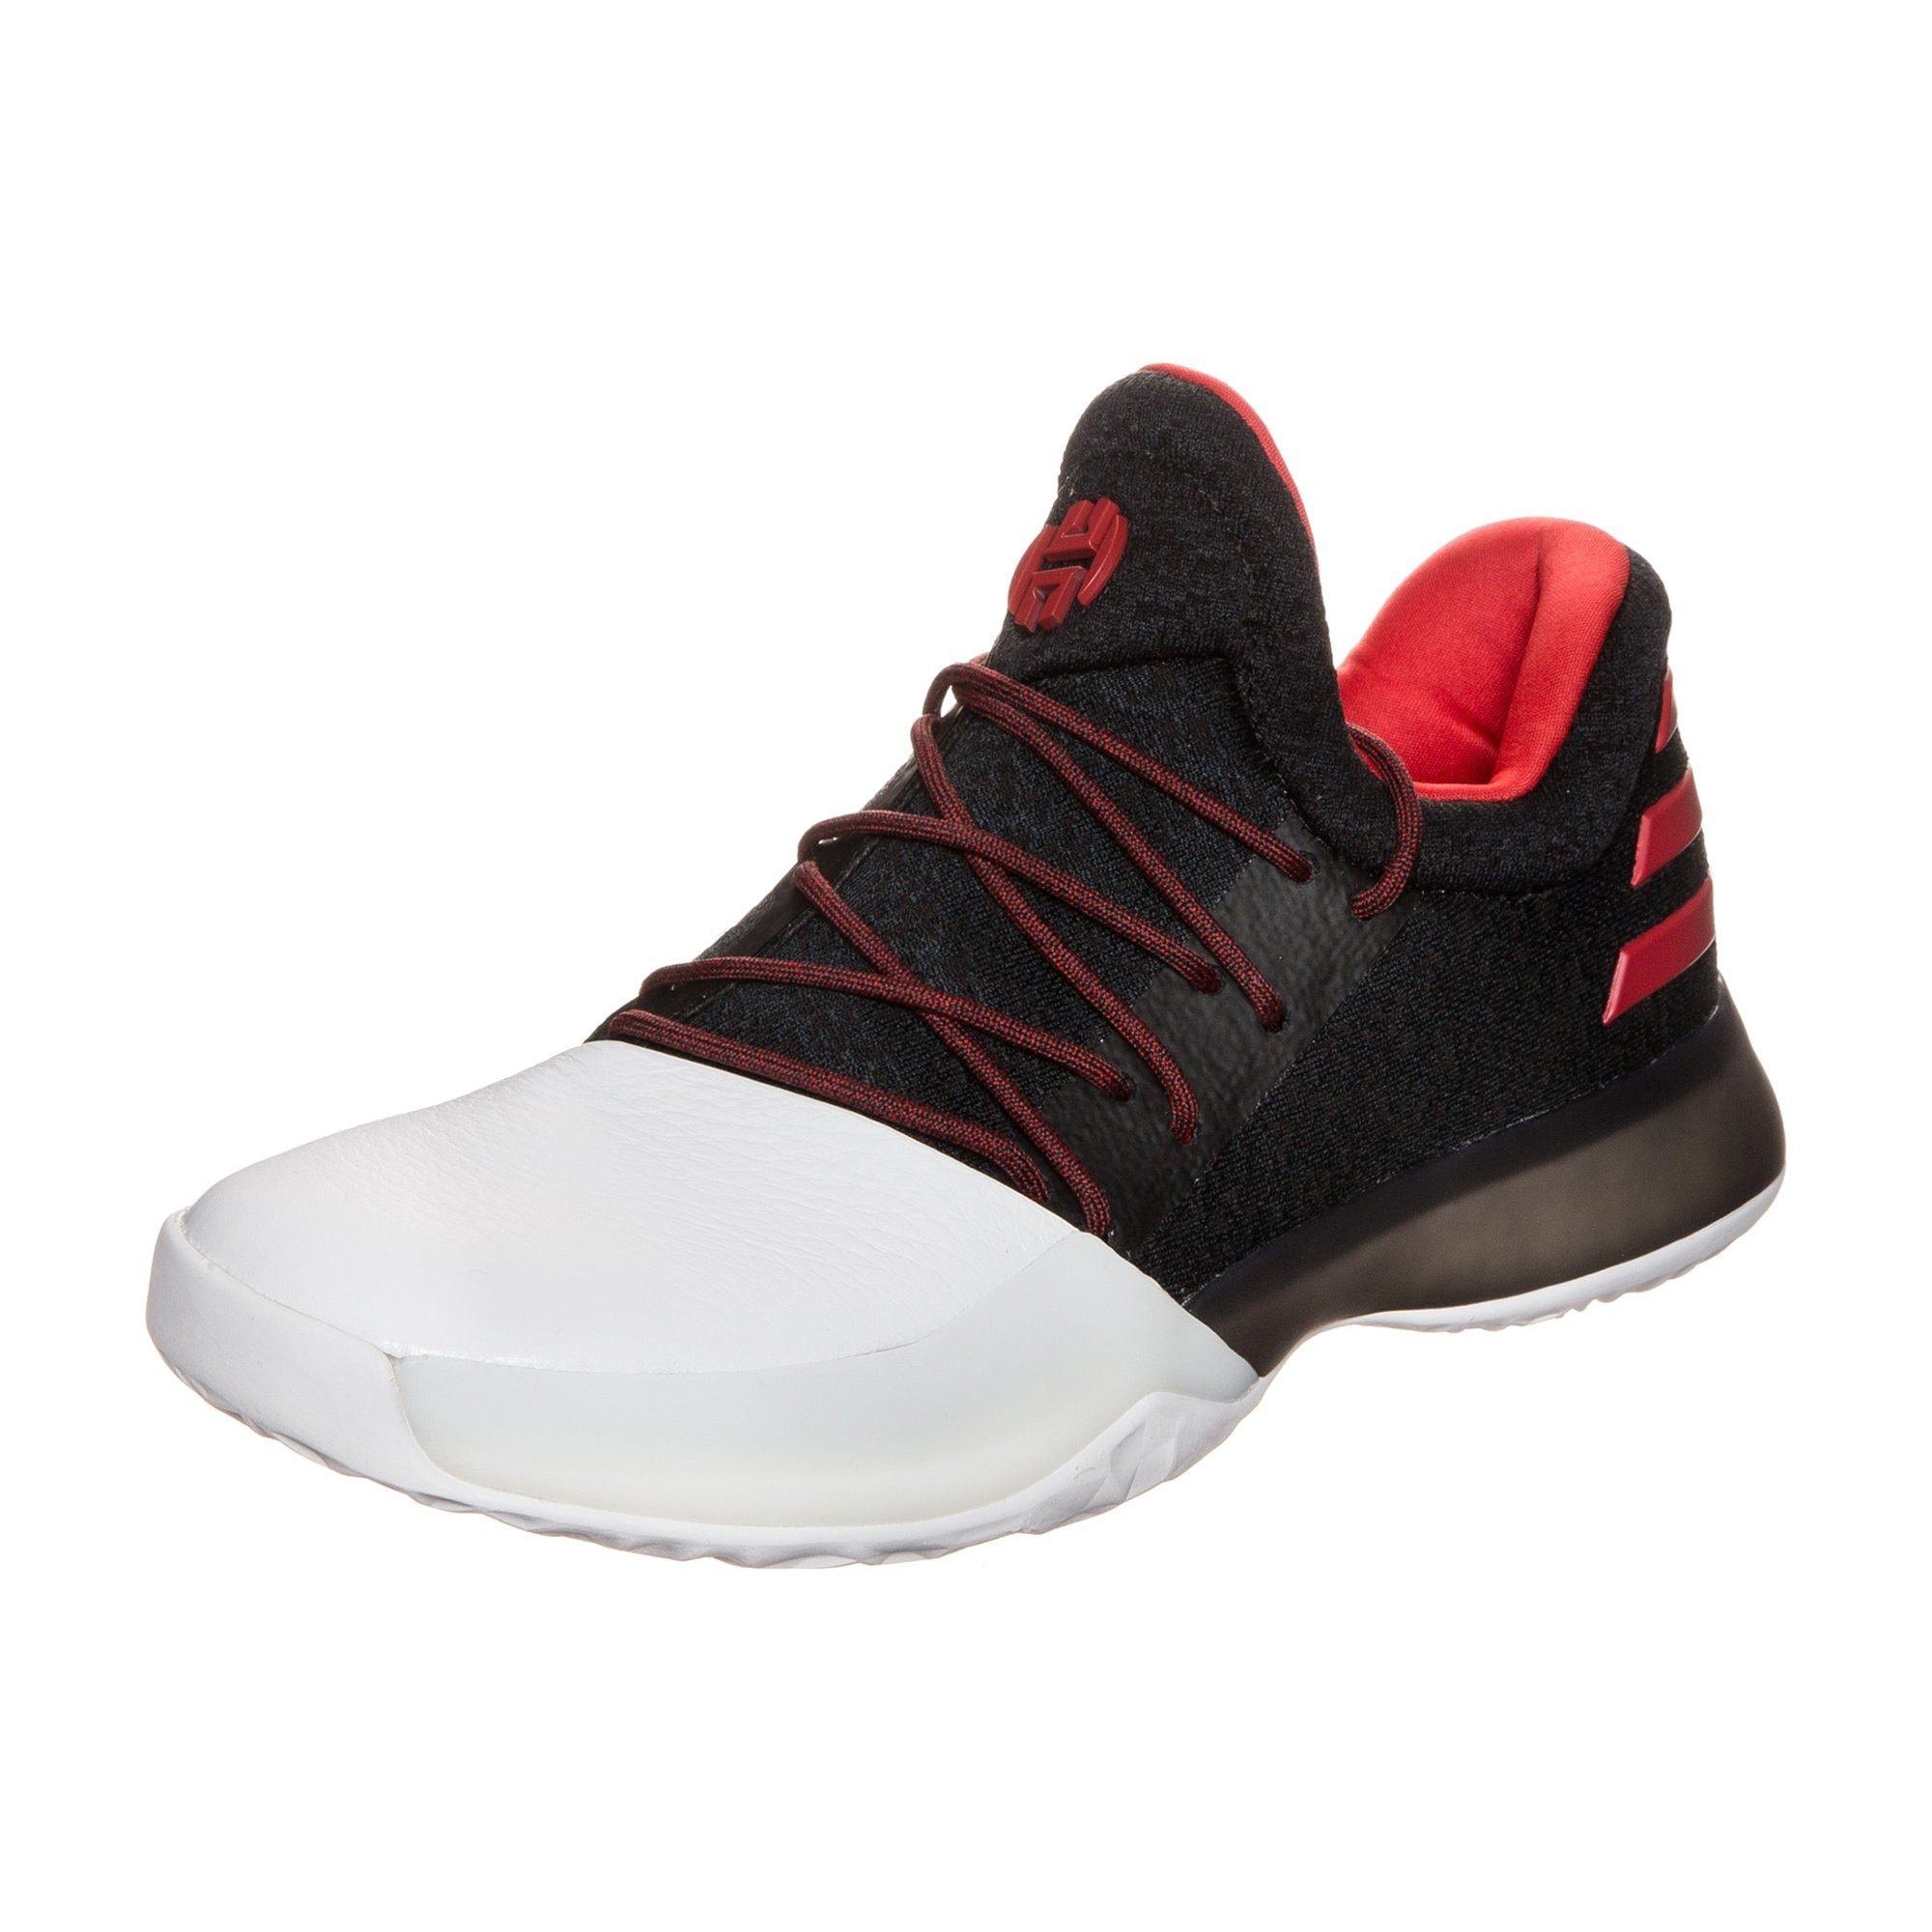 adidas Schuhe Kinder : 75% Rabatt